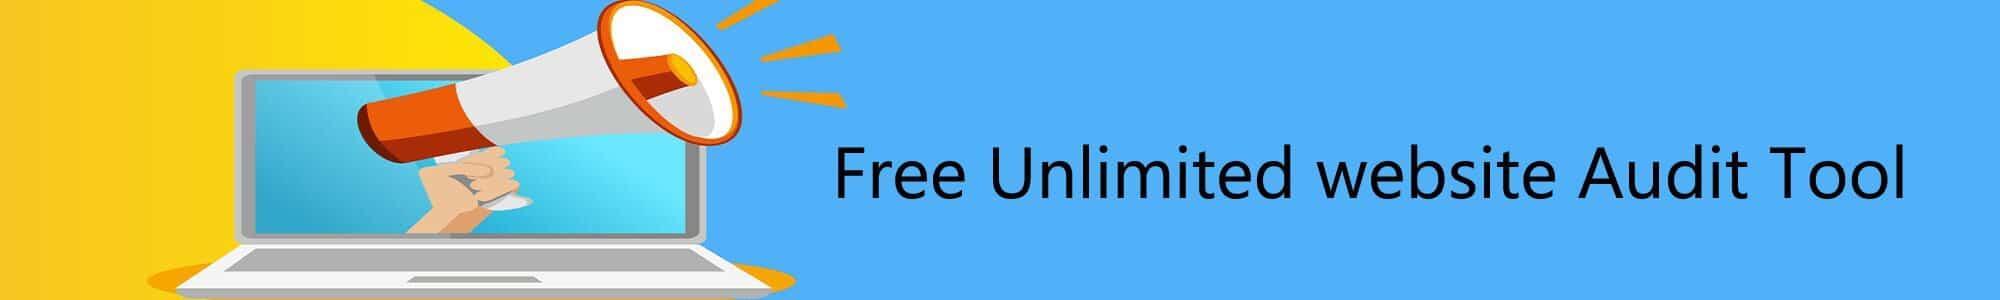 Unlimited free website Audit tool